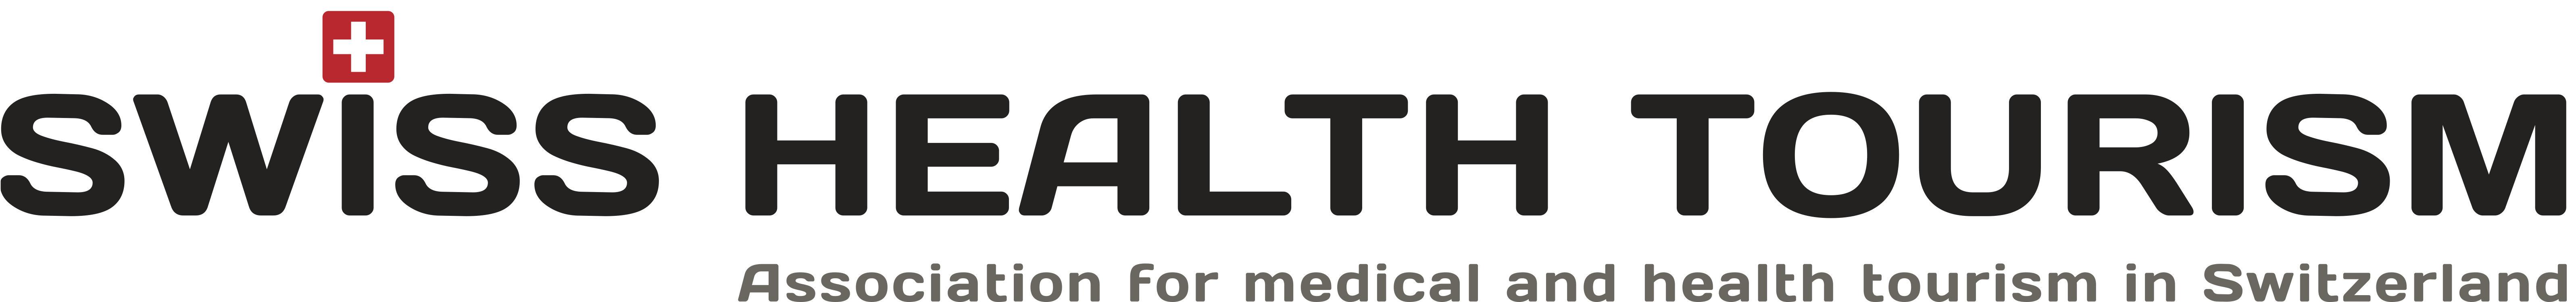 Swiss Health Tourism